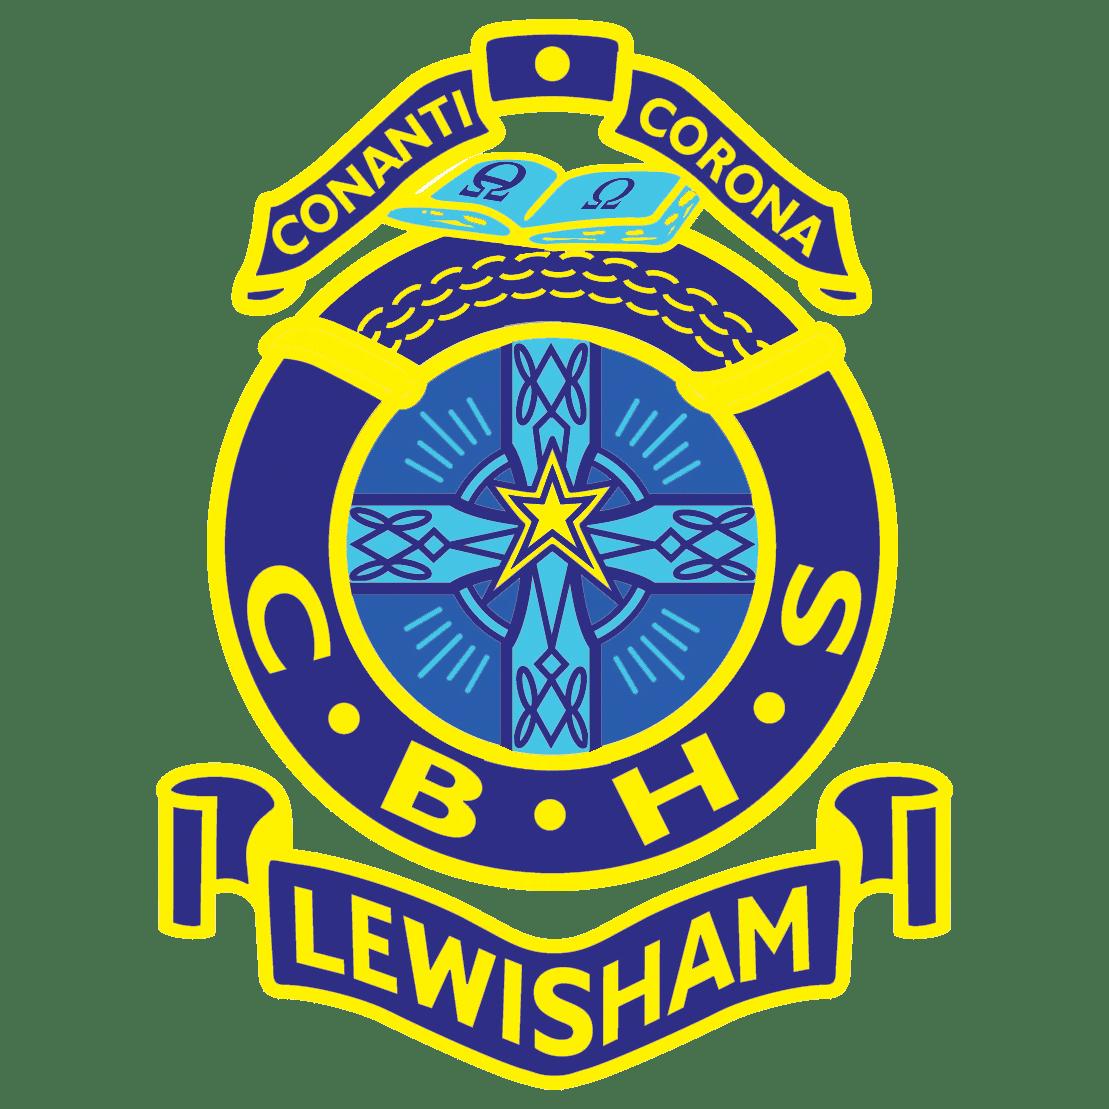 CBHS Lewisham -